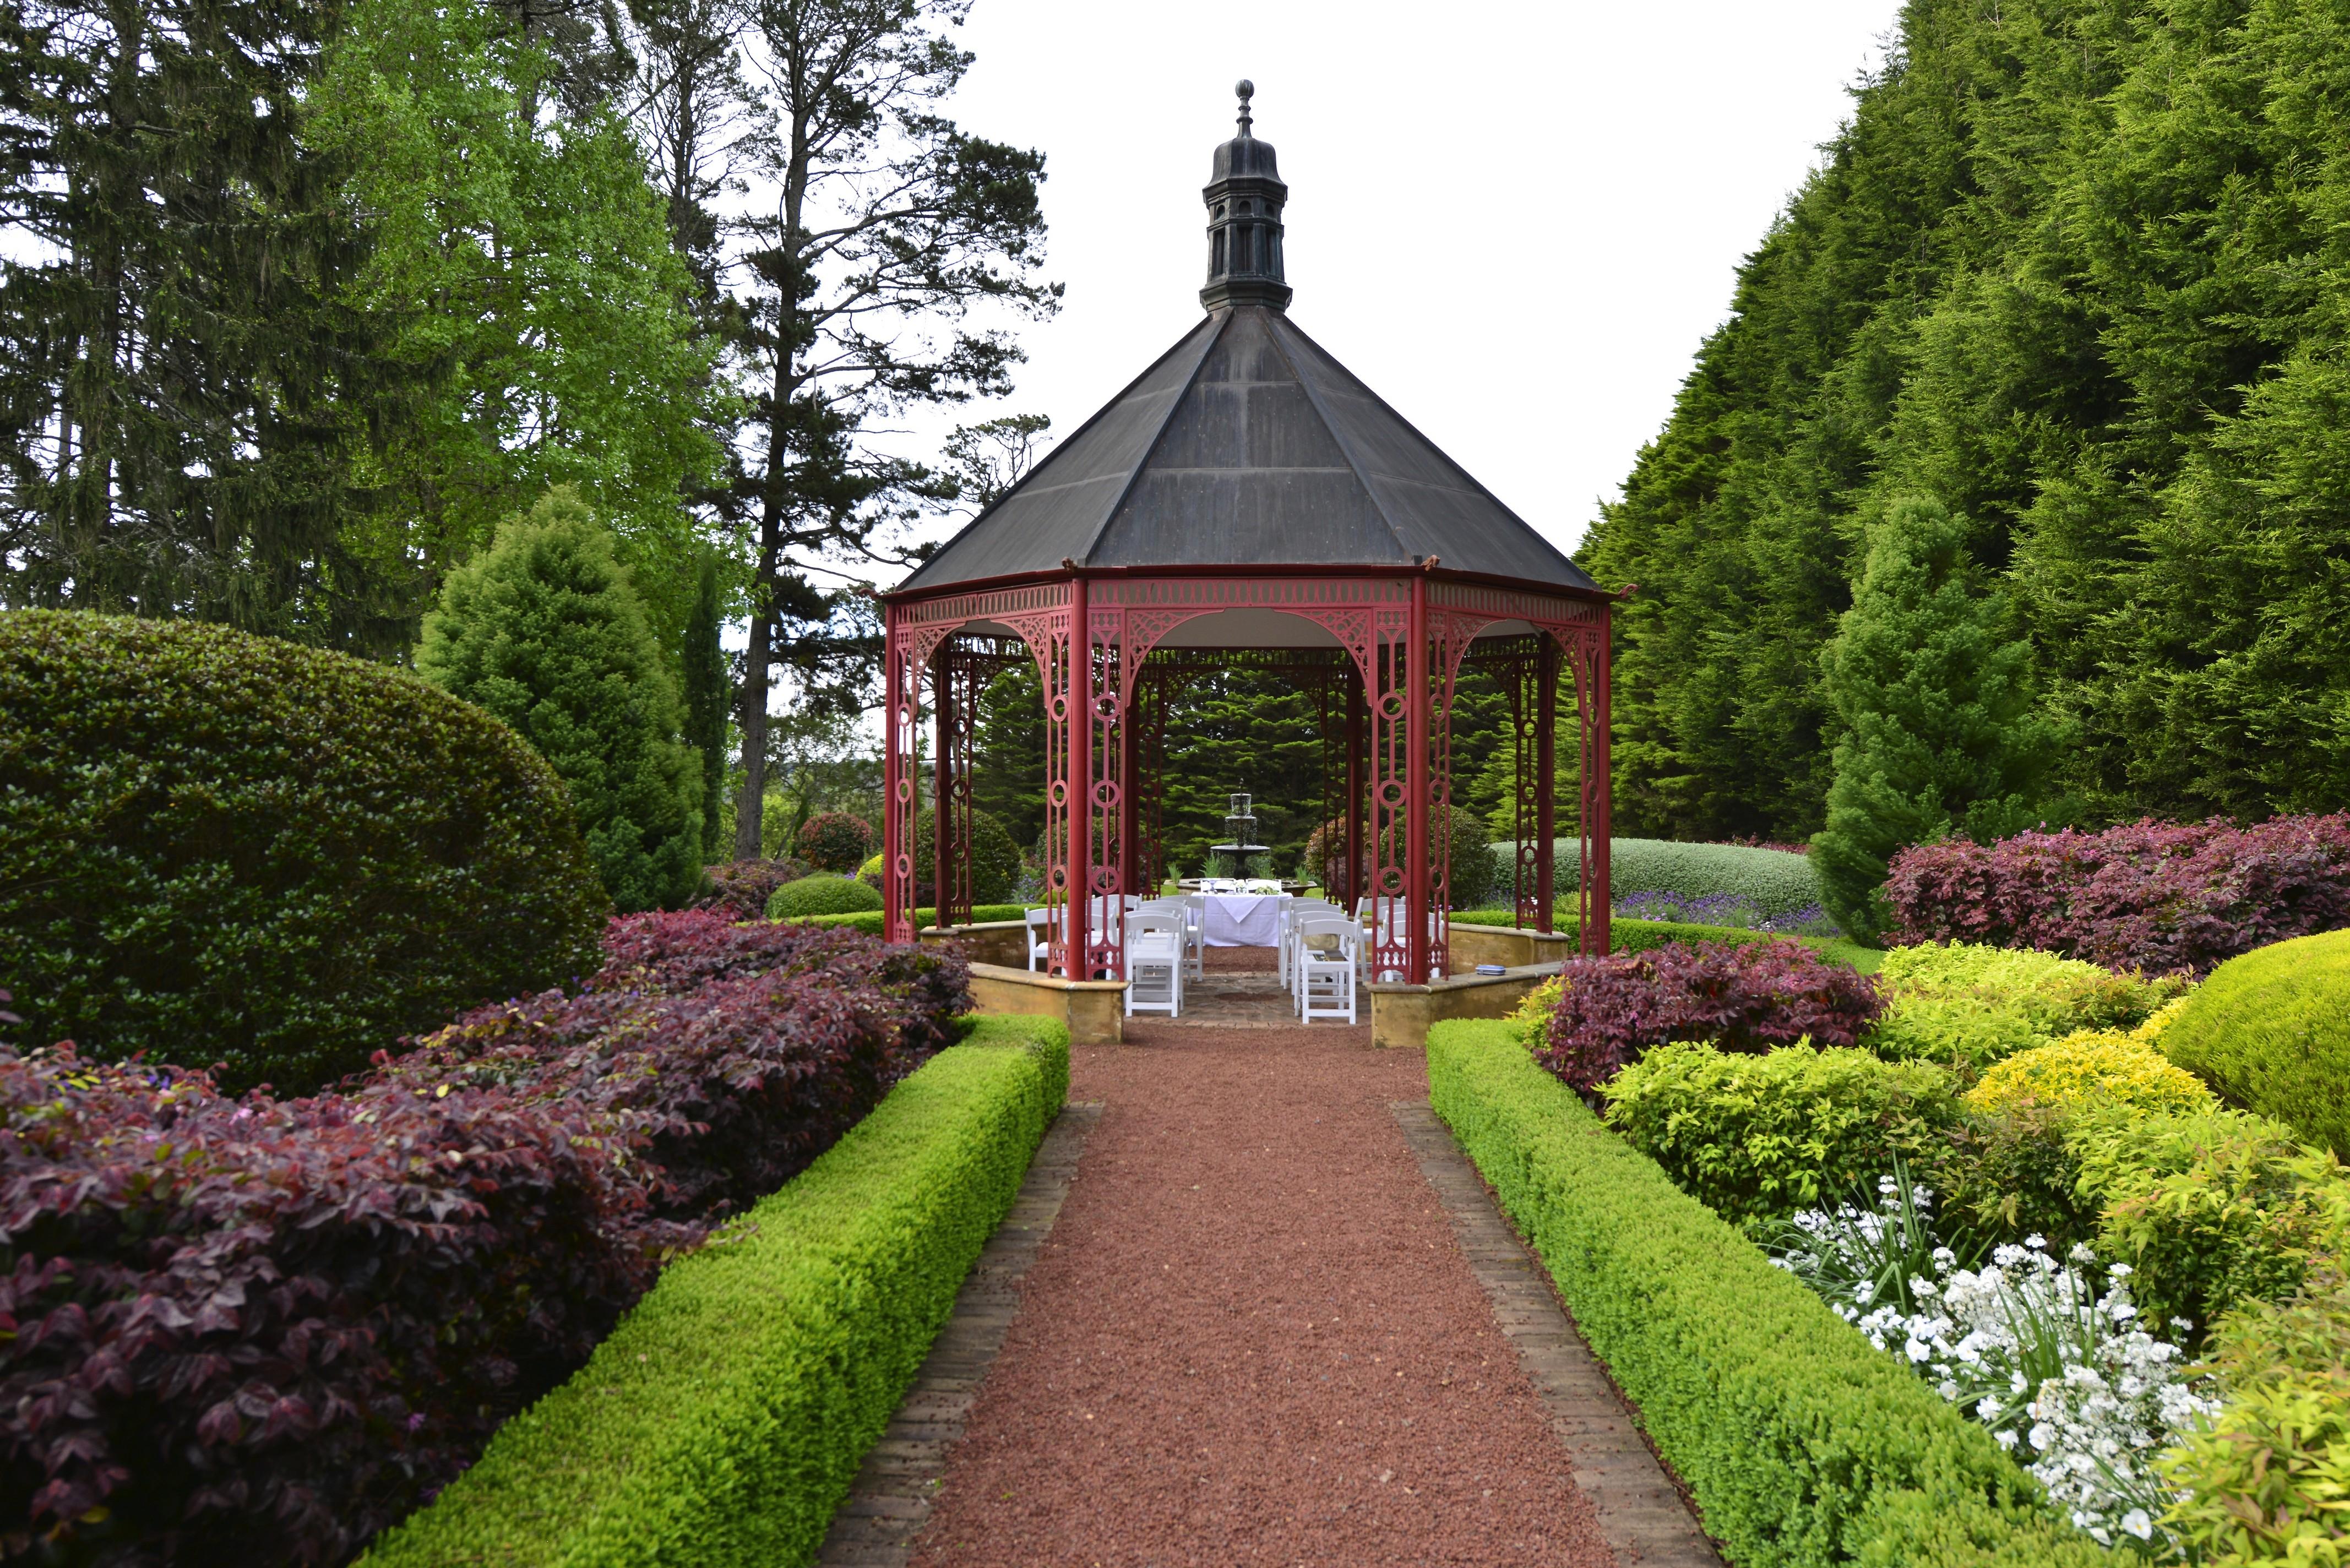 Rotunda, set for ceremony